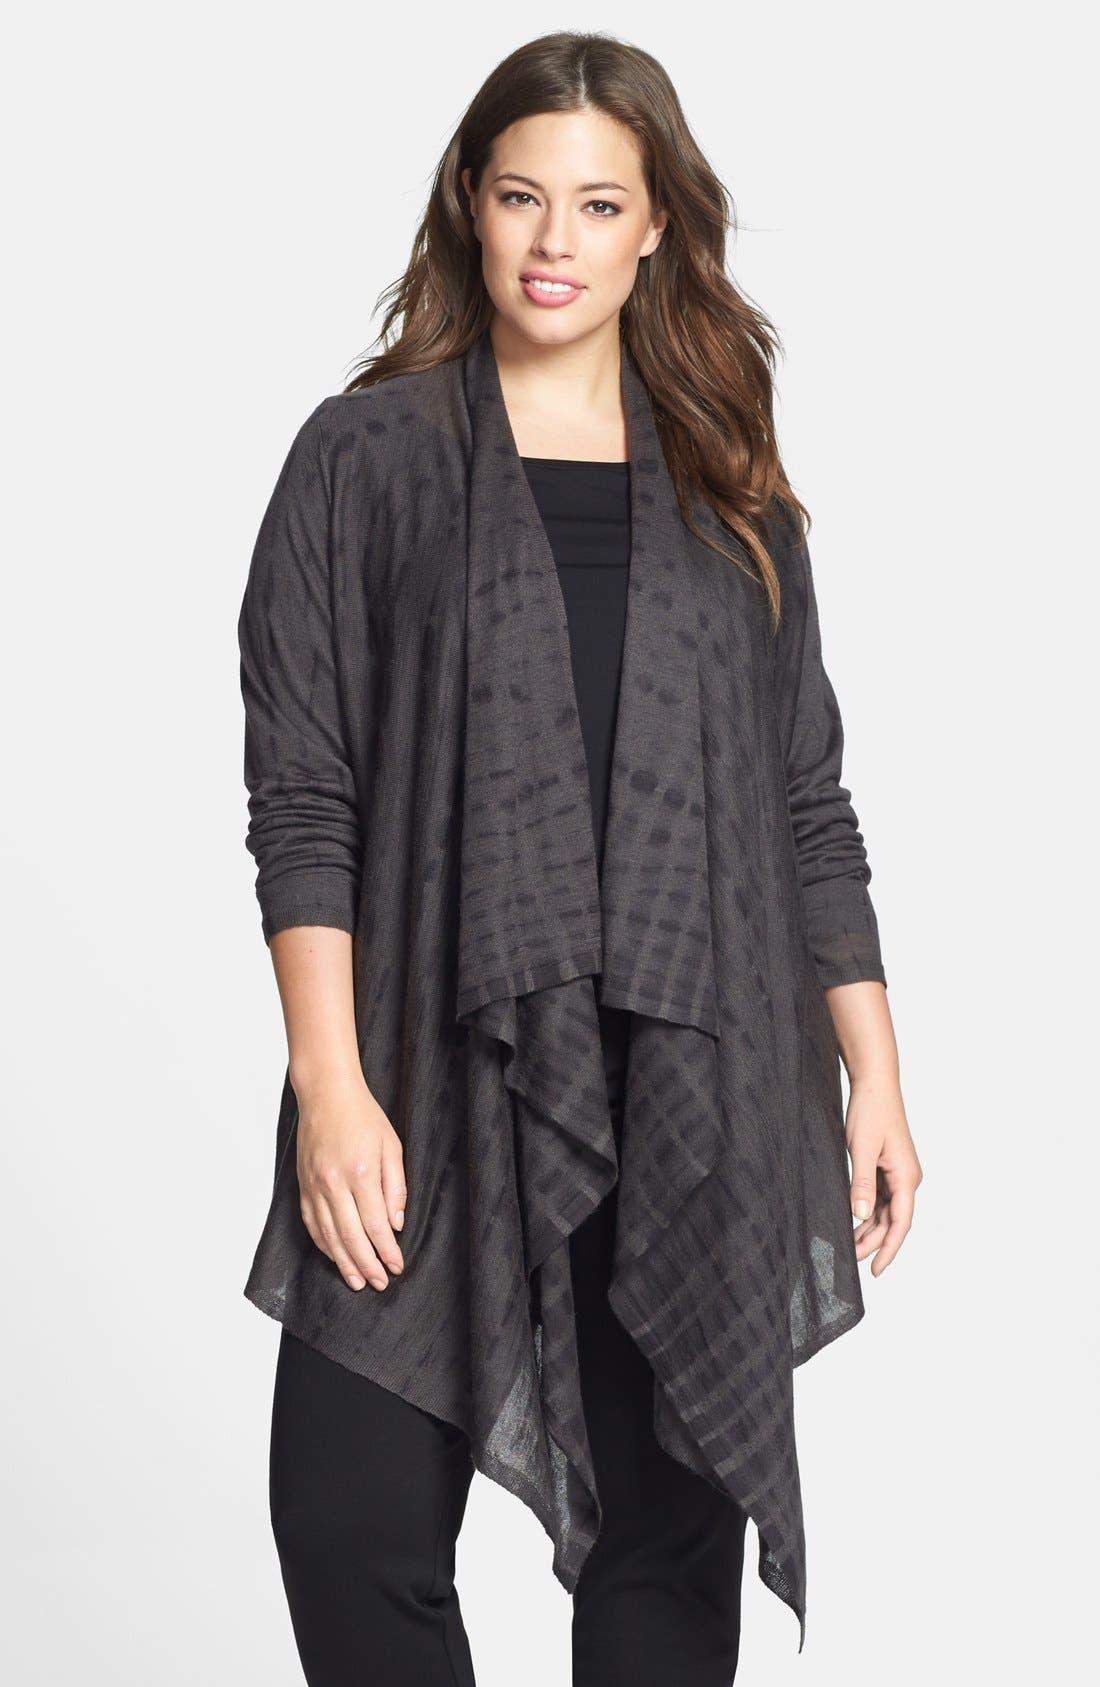 Alternate Image 1 Selected - Eileen Fisher Tie Dye Alpaca & Silk Cardigan (Plus Size)